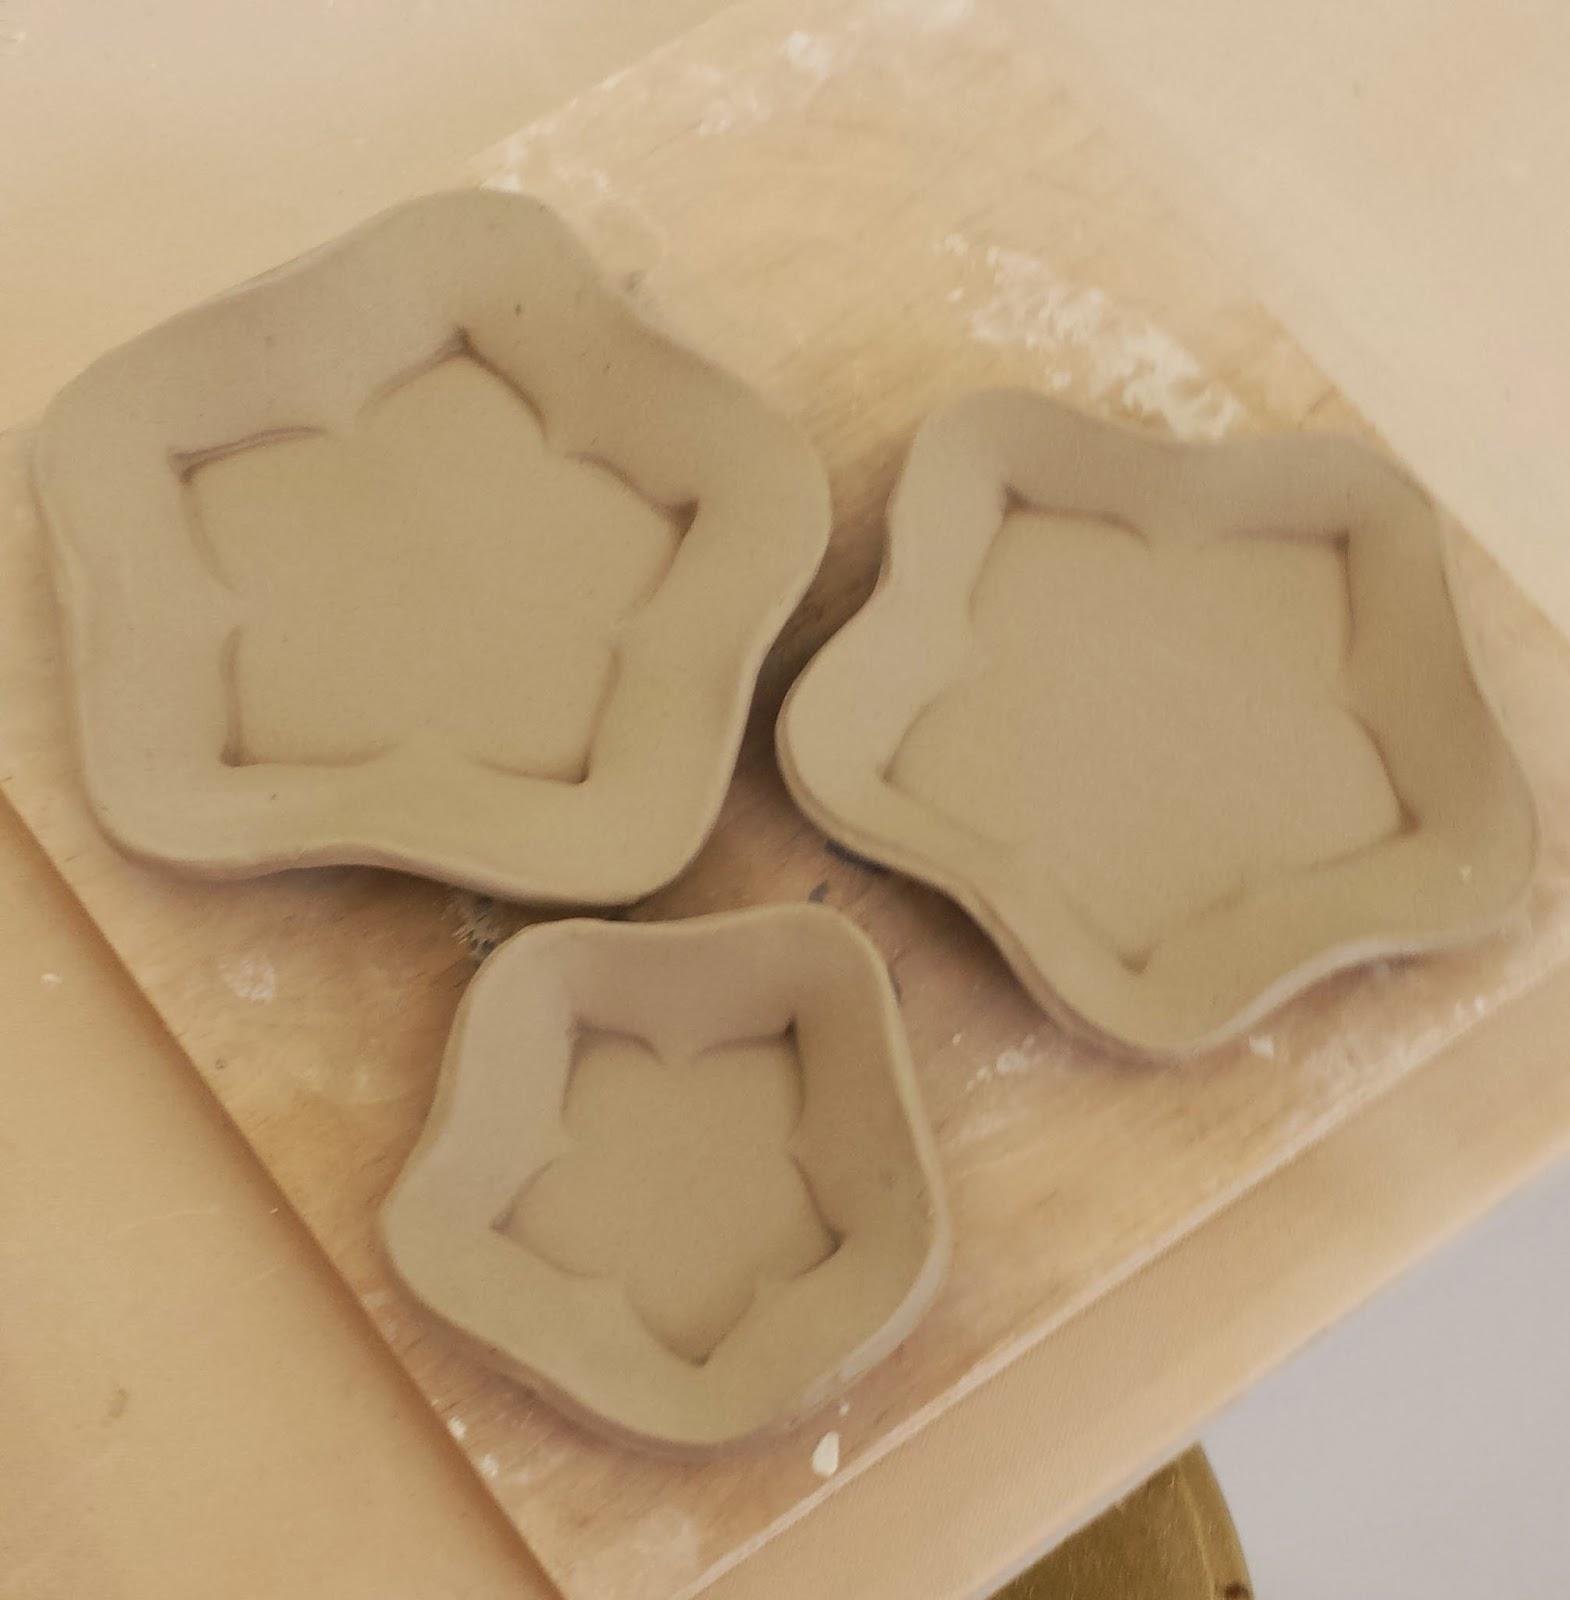 Slab-made ceramic pottery plates, pressed into foam to create the shape.